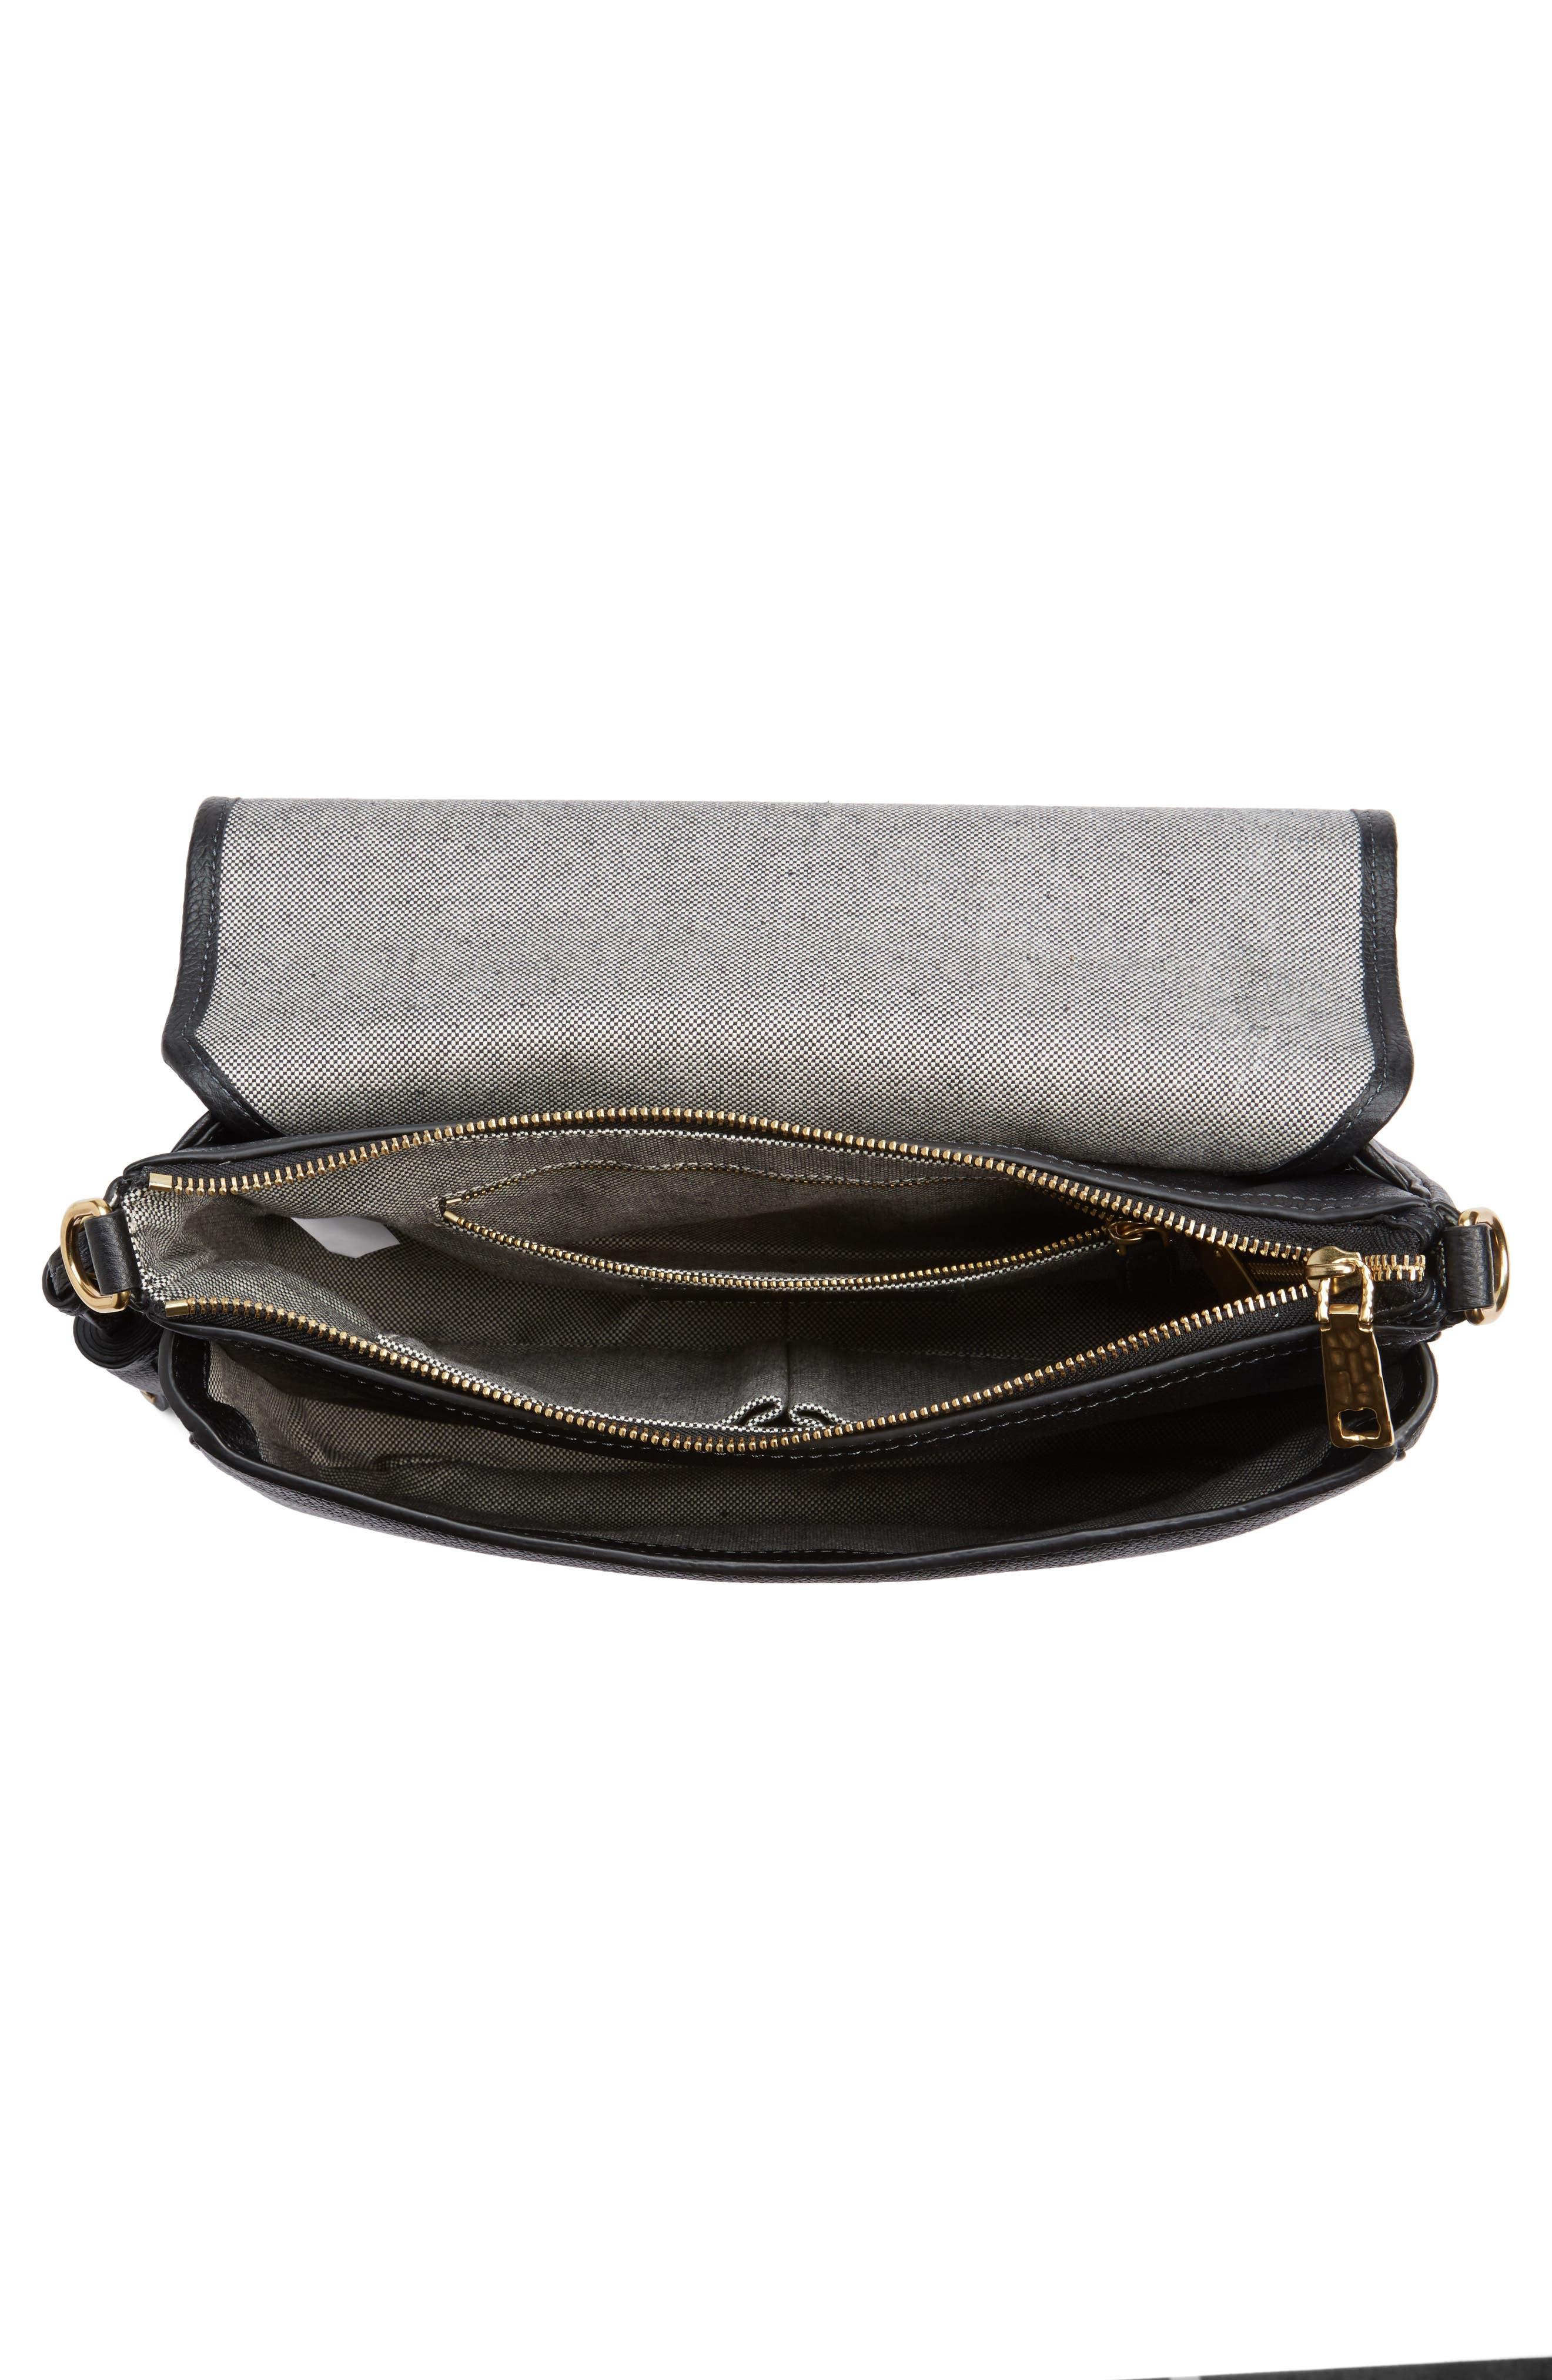 Interlock Leather Crossbody Bag,                             Alternate thumbnail 4, color,                             001